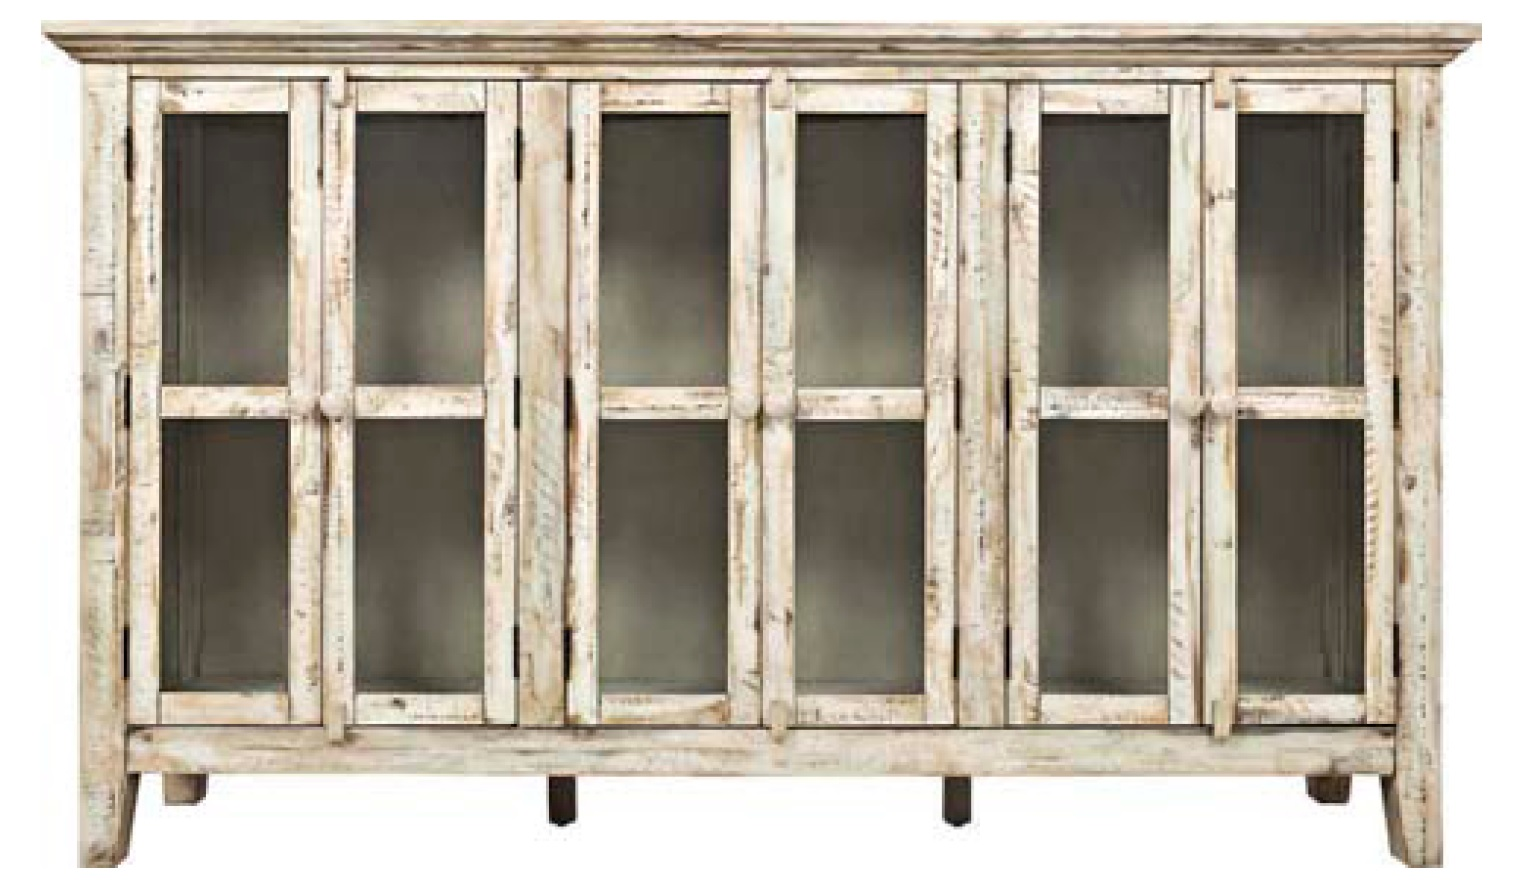 Eau Claire 6-door accent cabinet in the color Scrimshaw